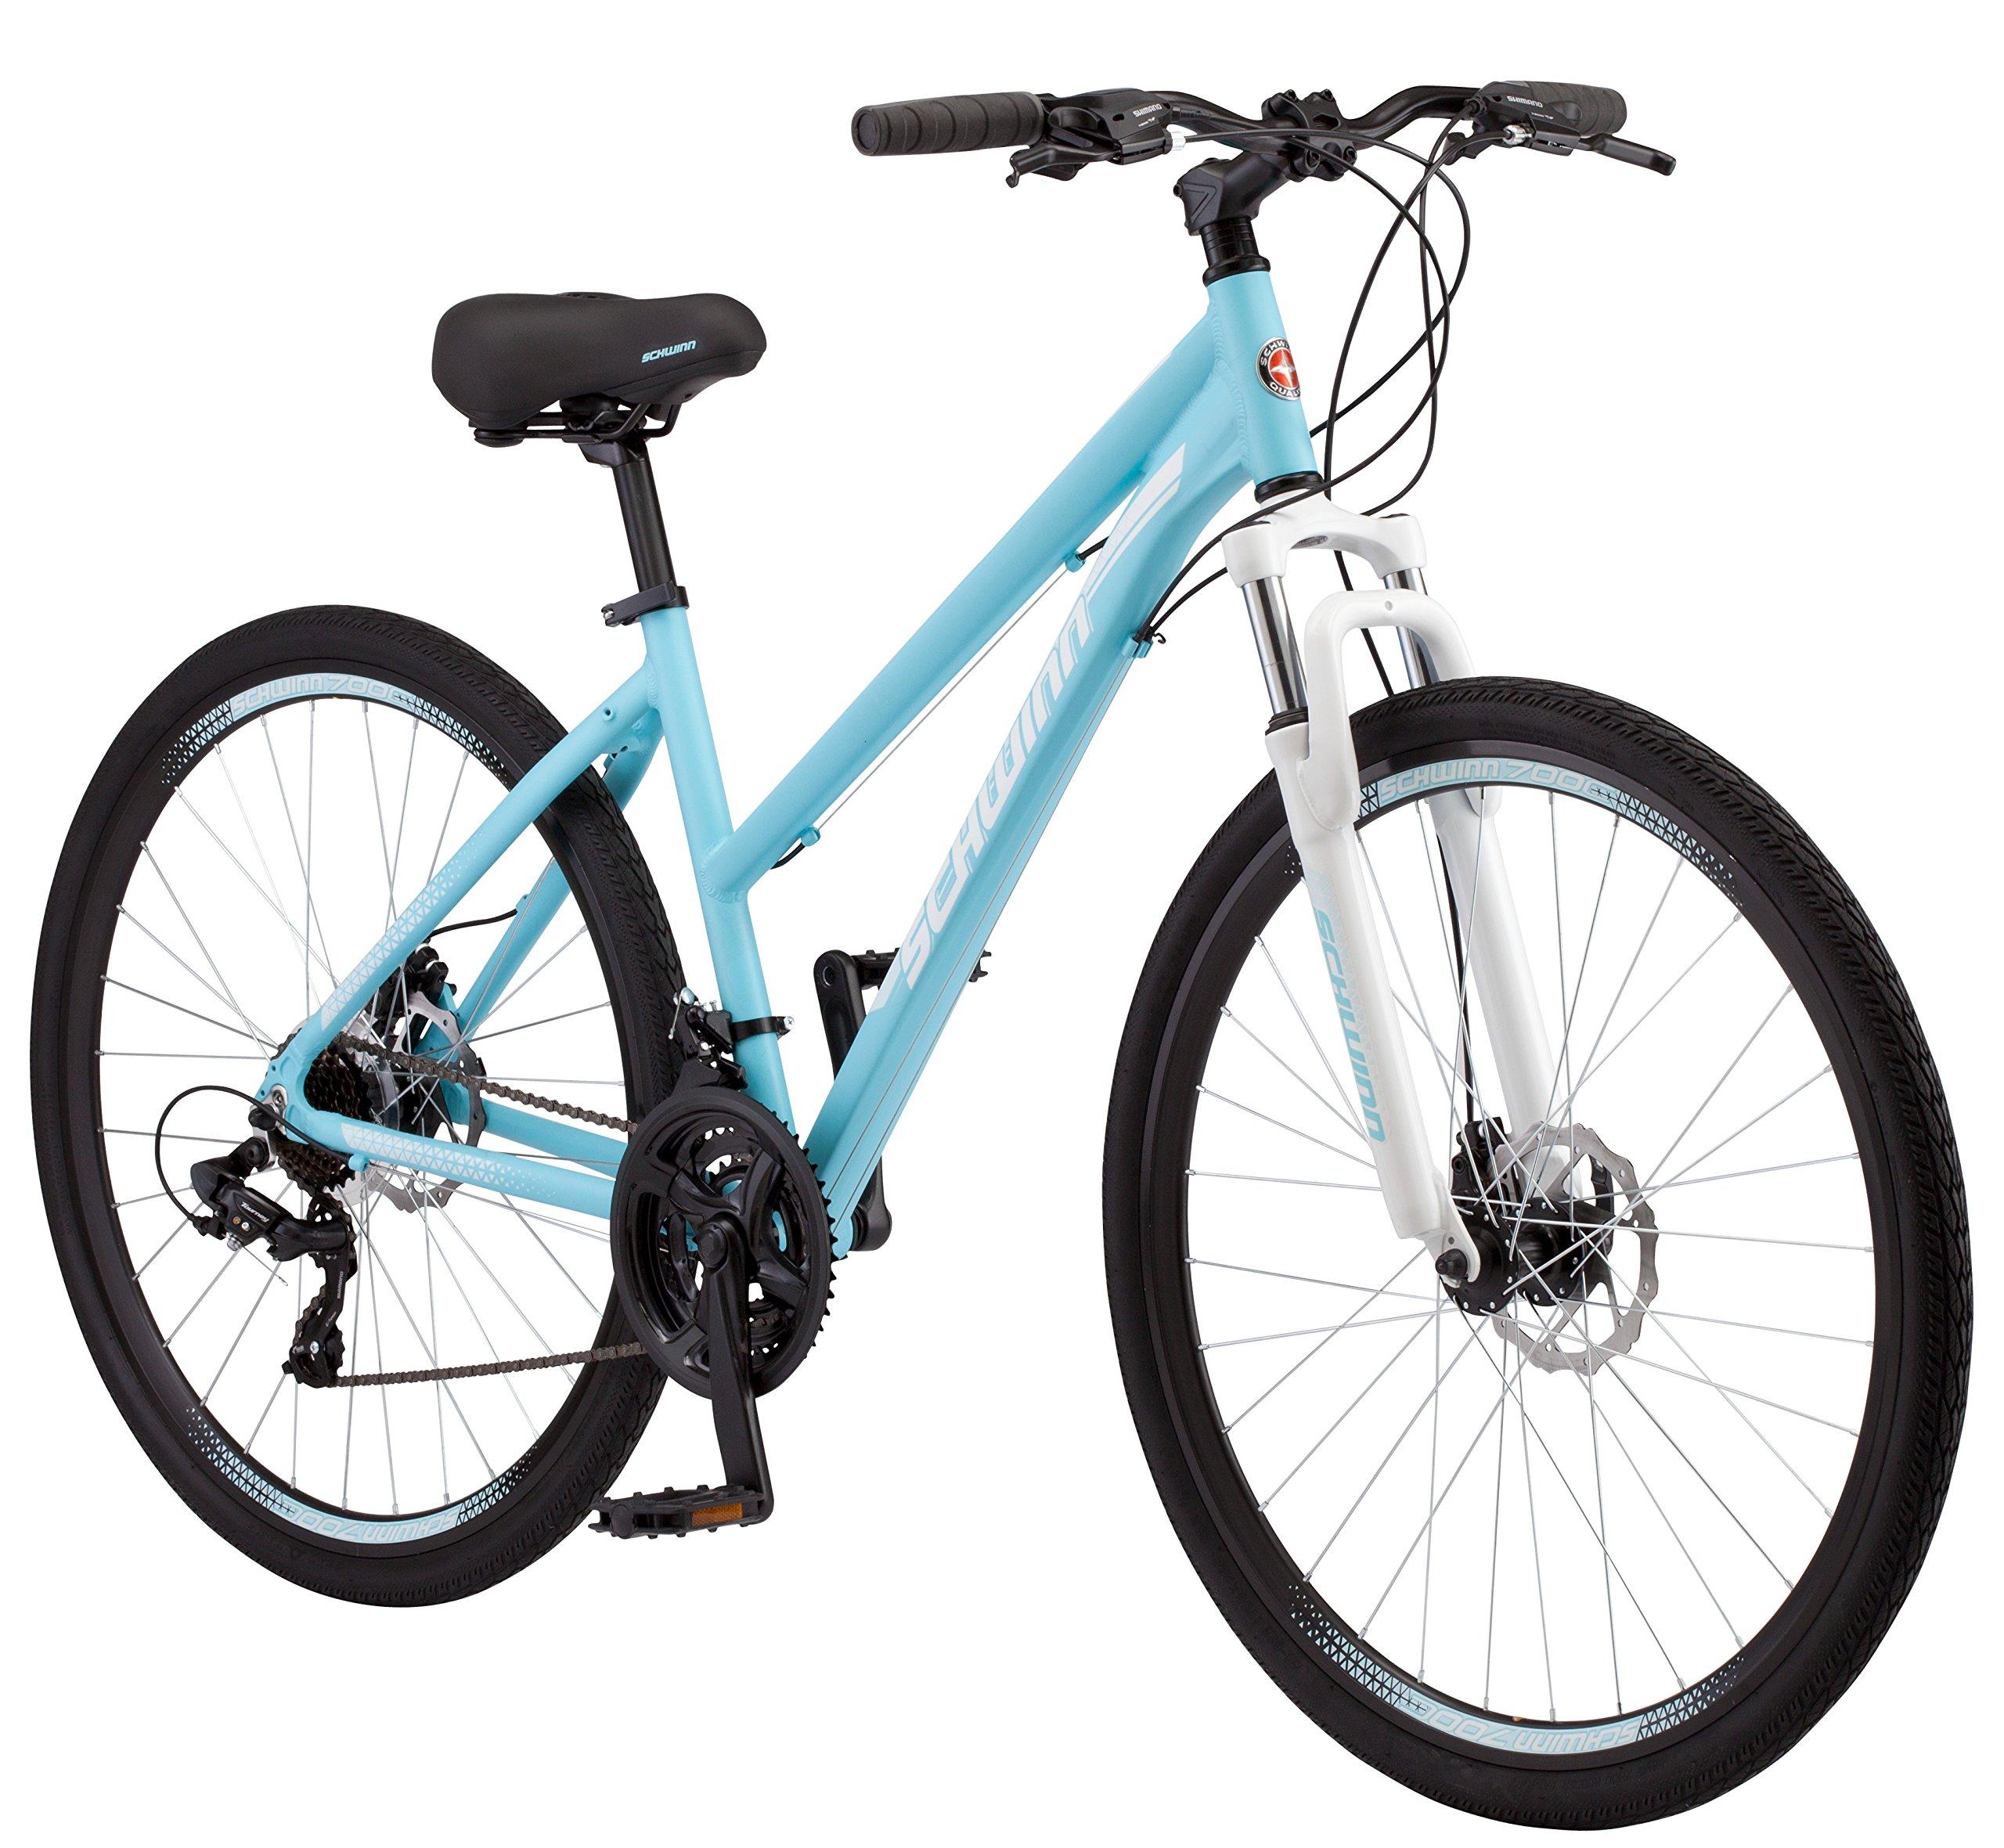 Schwinn GTX 2 Women's Dual Sport 700c Wheel Bicycle, Blue, 16 ''/Small Frame Size